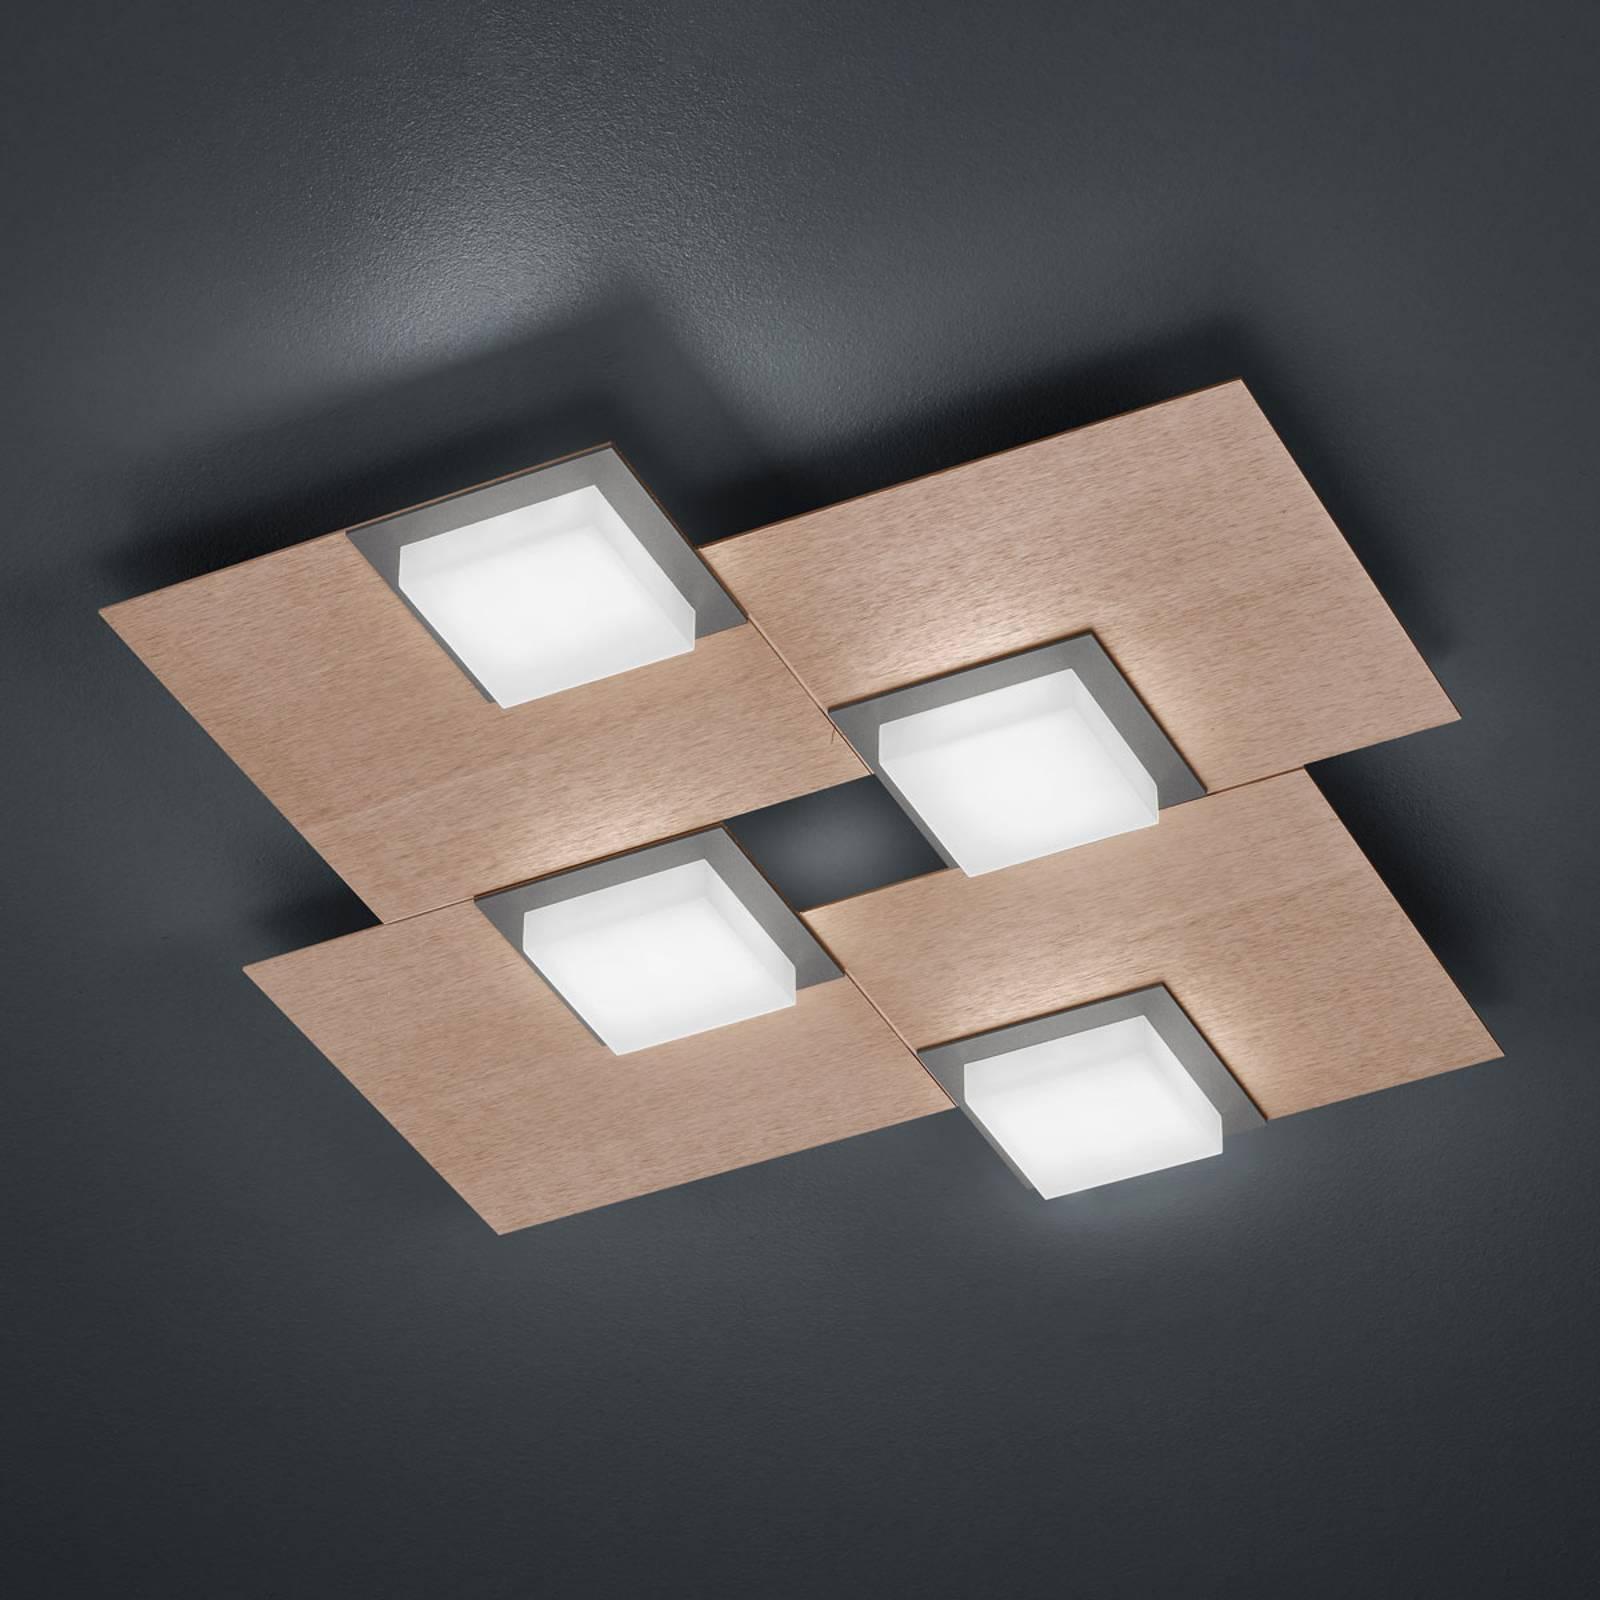 BANKAMP Quadro LED-plafondlamp 32 W rosé goud